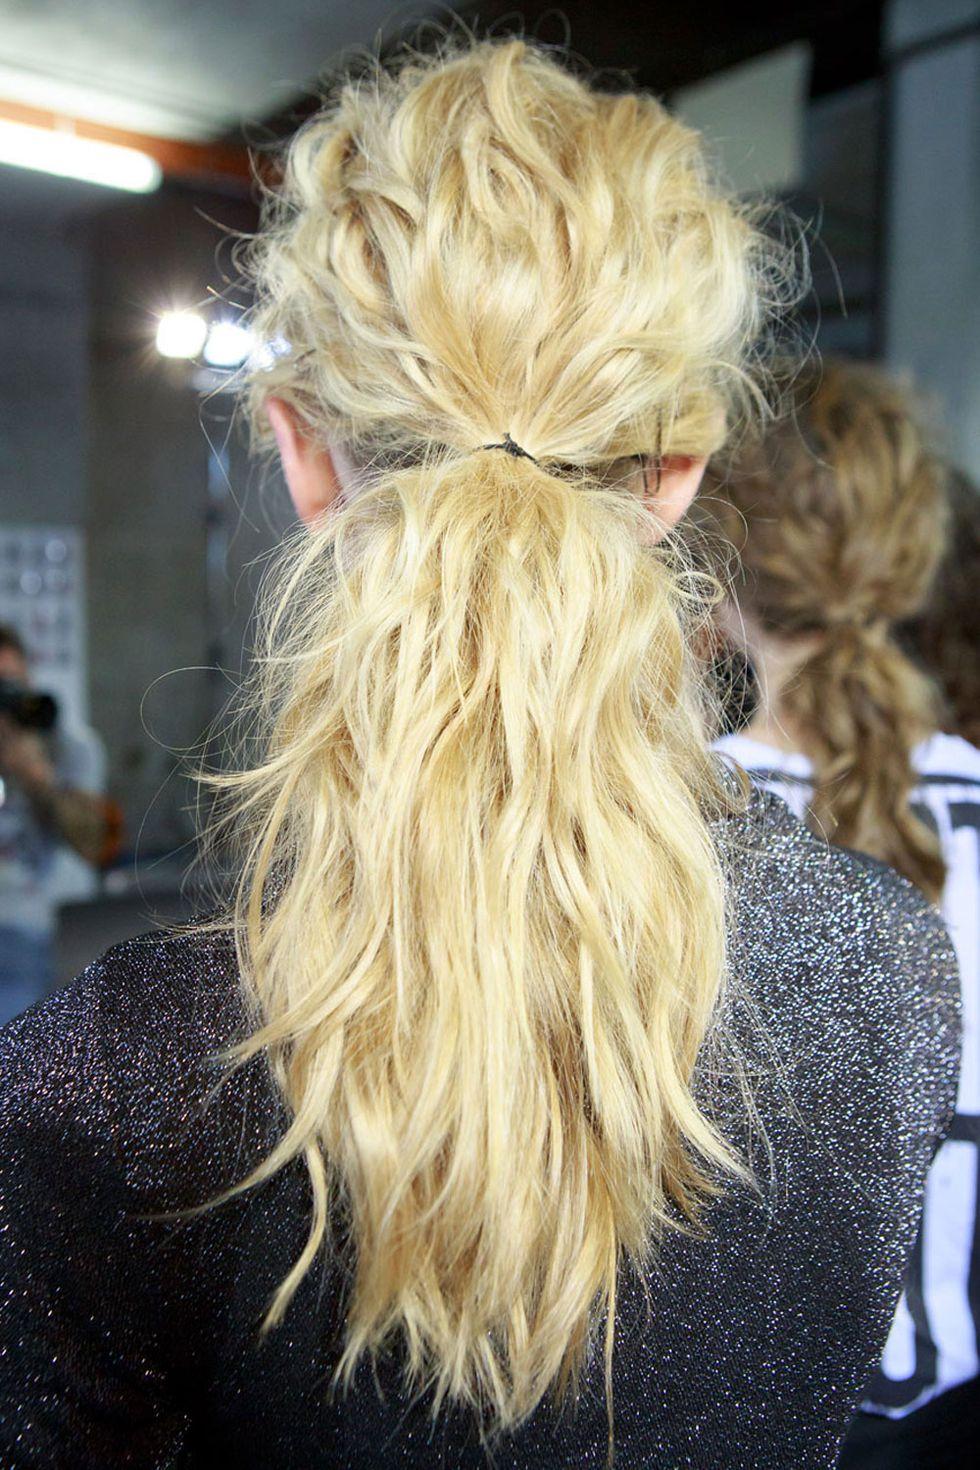 wedding-guest-hair-ponytail-style-beauty-ponytail-wavy-messy-low-pony.jpg